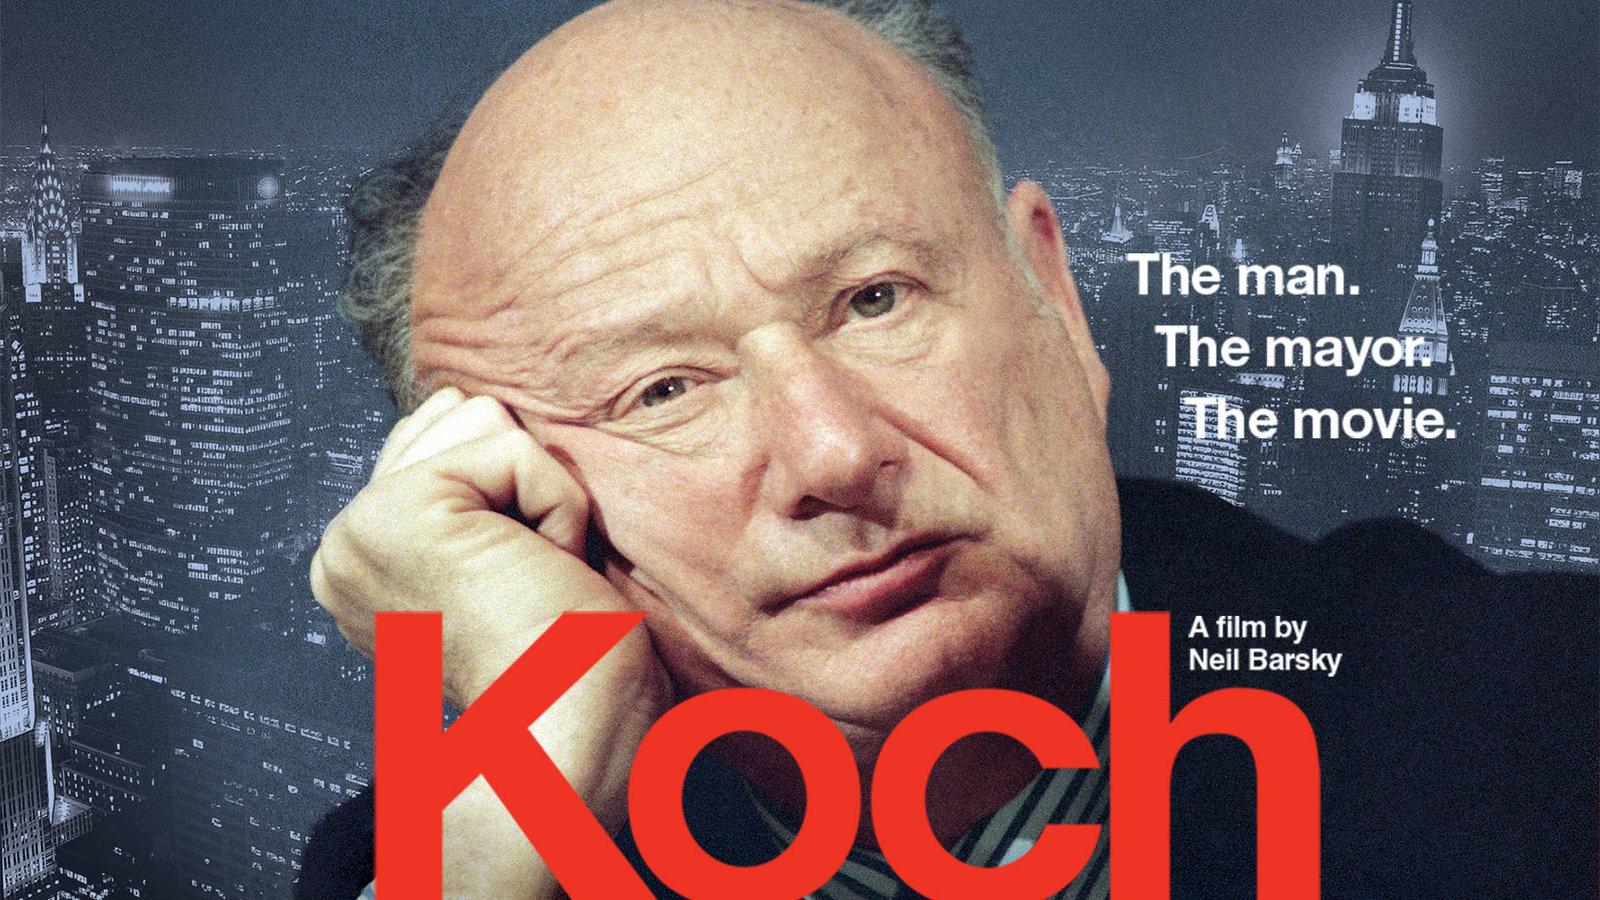 Koch - The Life and Career of a New York Mayor